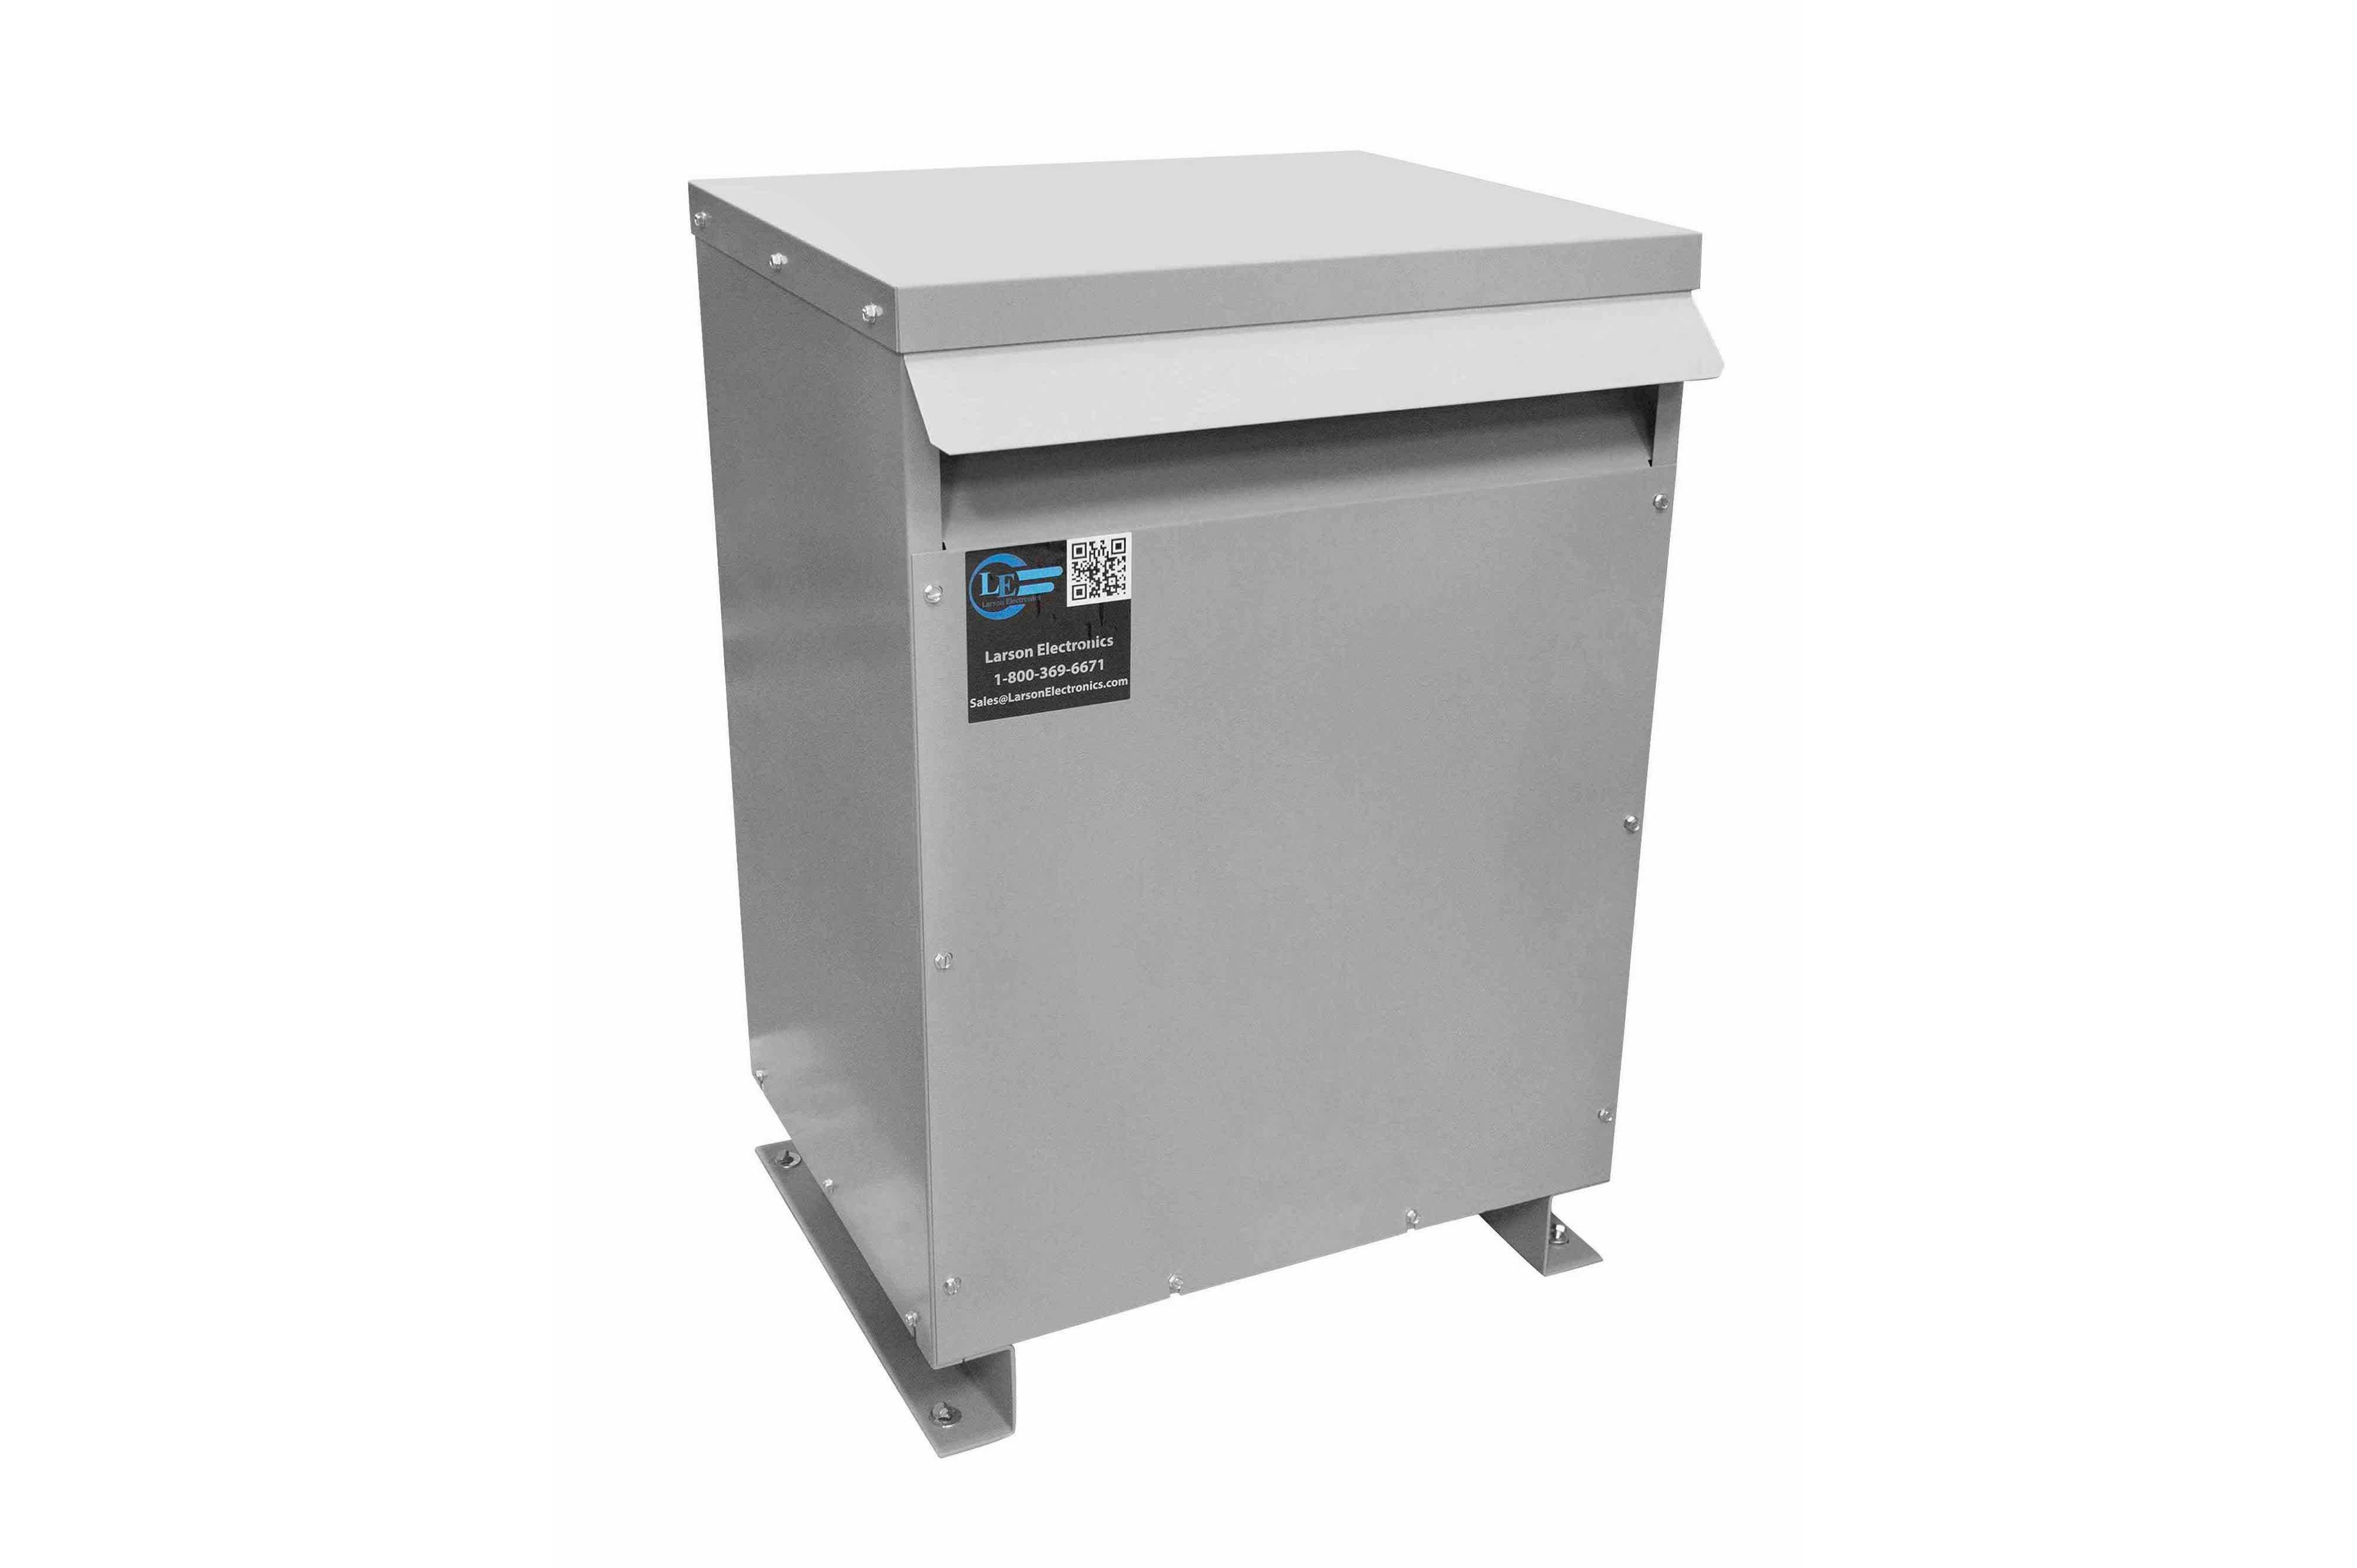 14 kVA 3PH Isolation Transformer, 460V Wye Primary, 380Y/220 Wye-N Secondary, N3R, Ventilated, 60 Hz